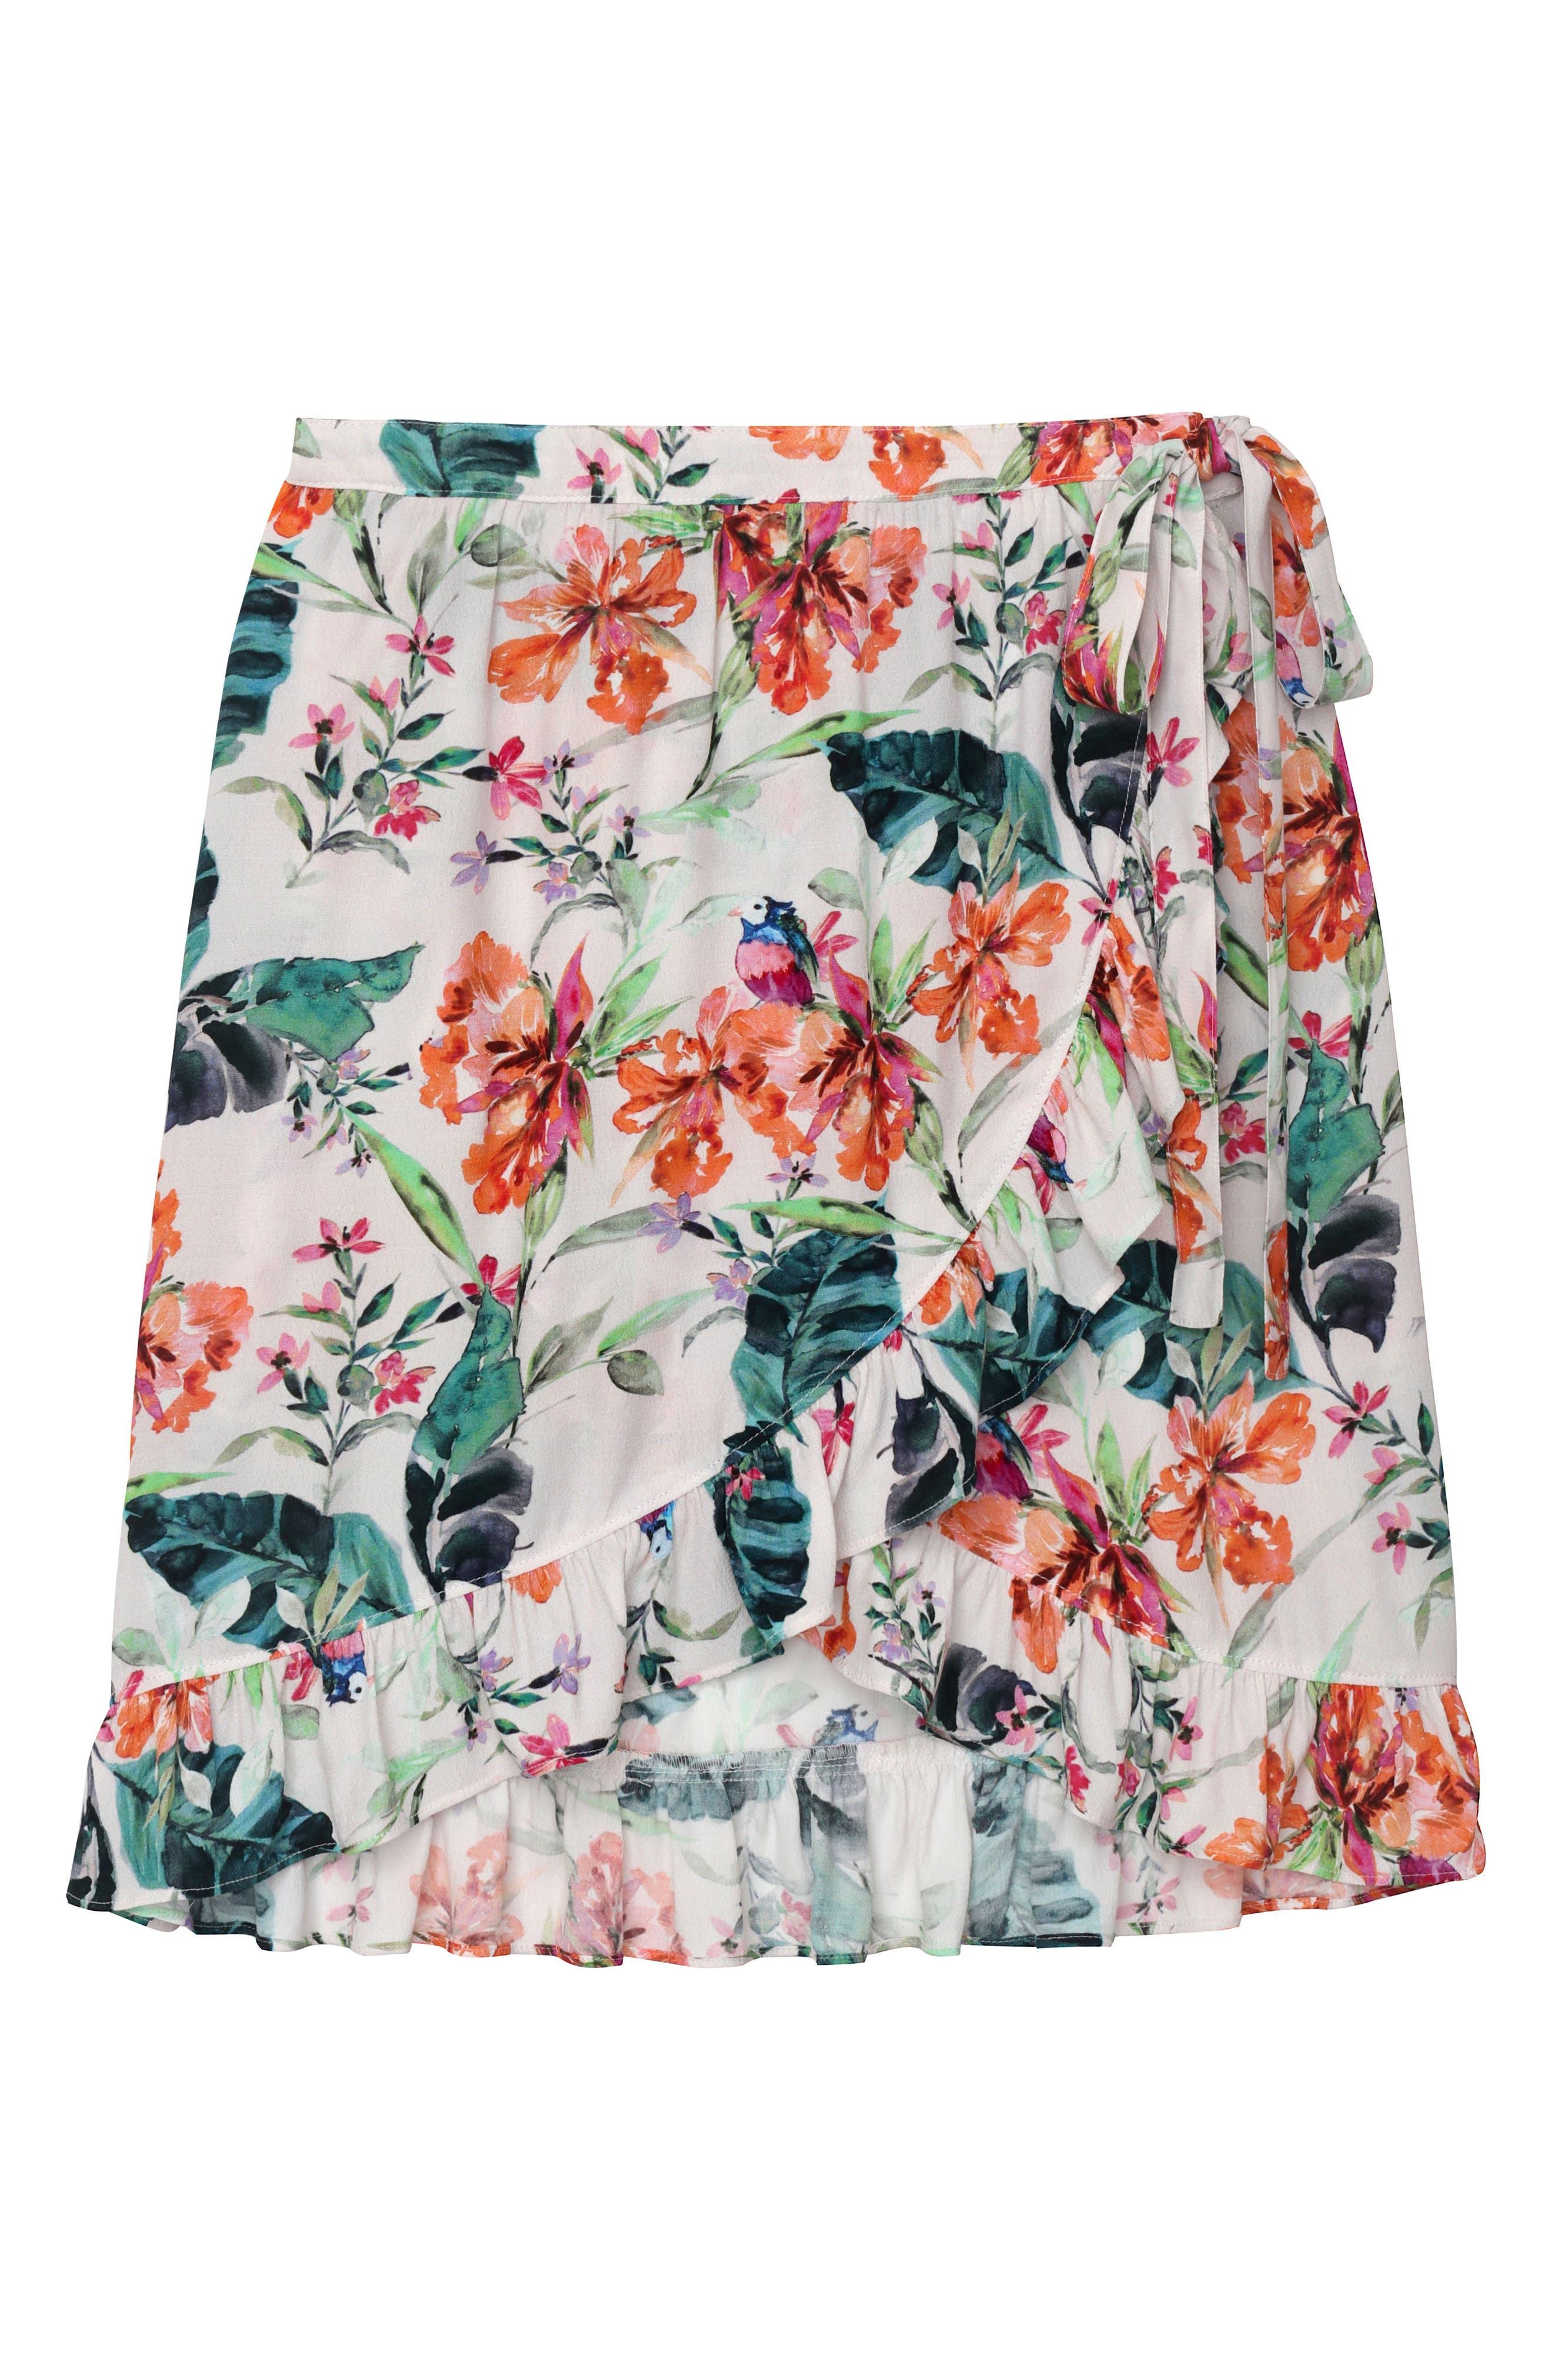 Tropicana Side Tie Ruffle Skirt,                             Alternate thumbnail 4, color,